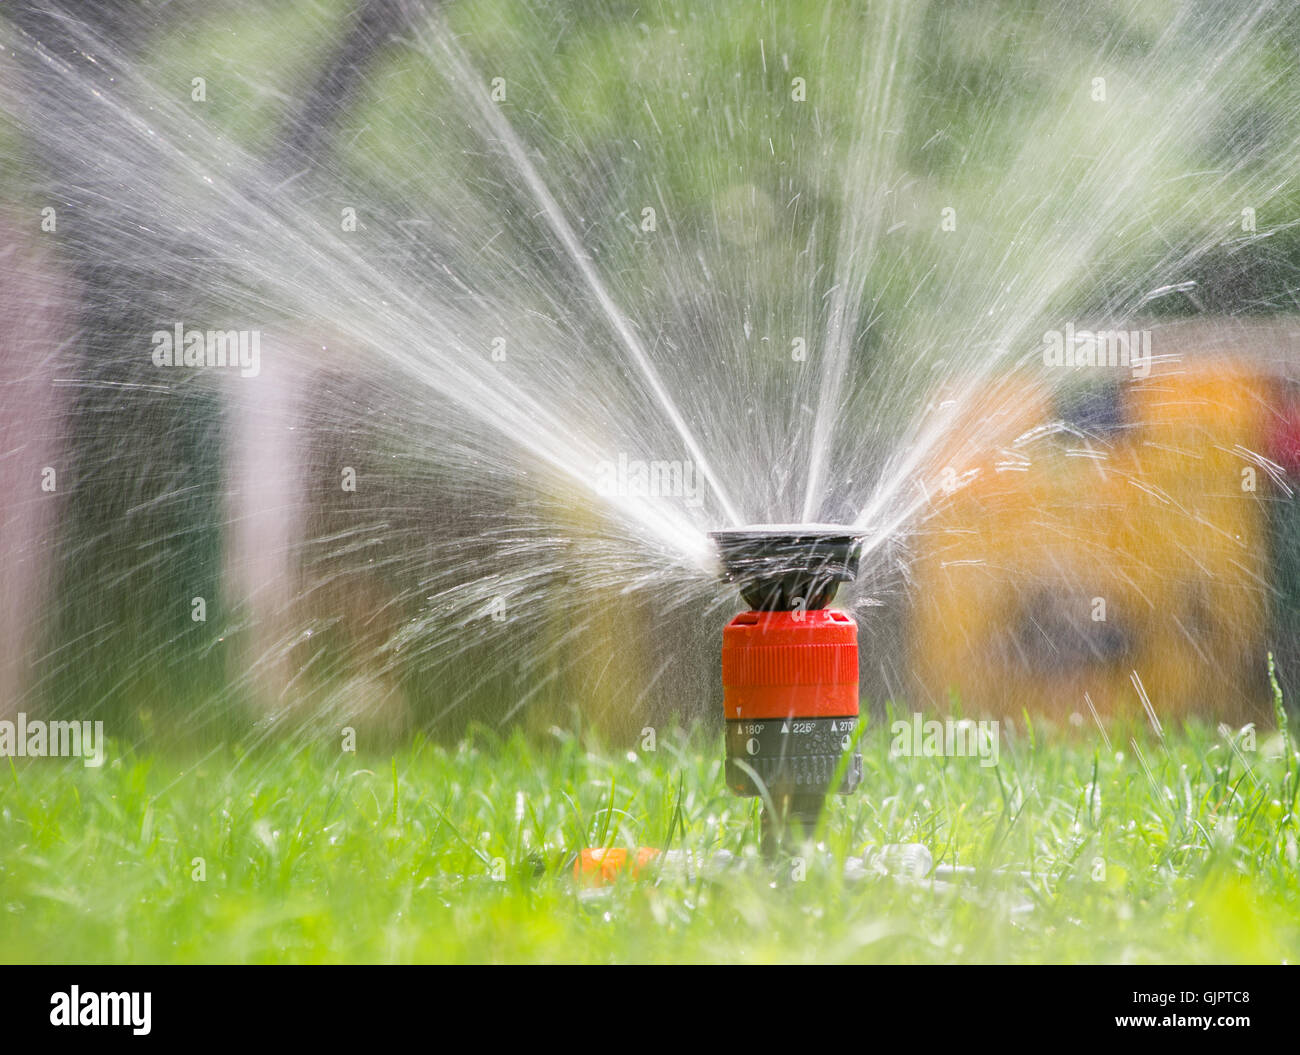 Sprinkler head spraying water on green lawn - Stock Image